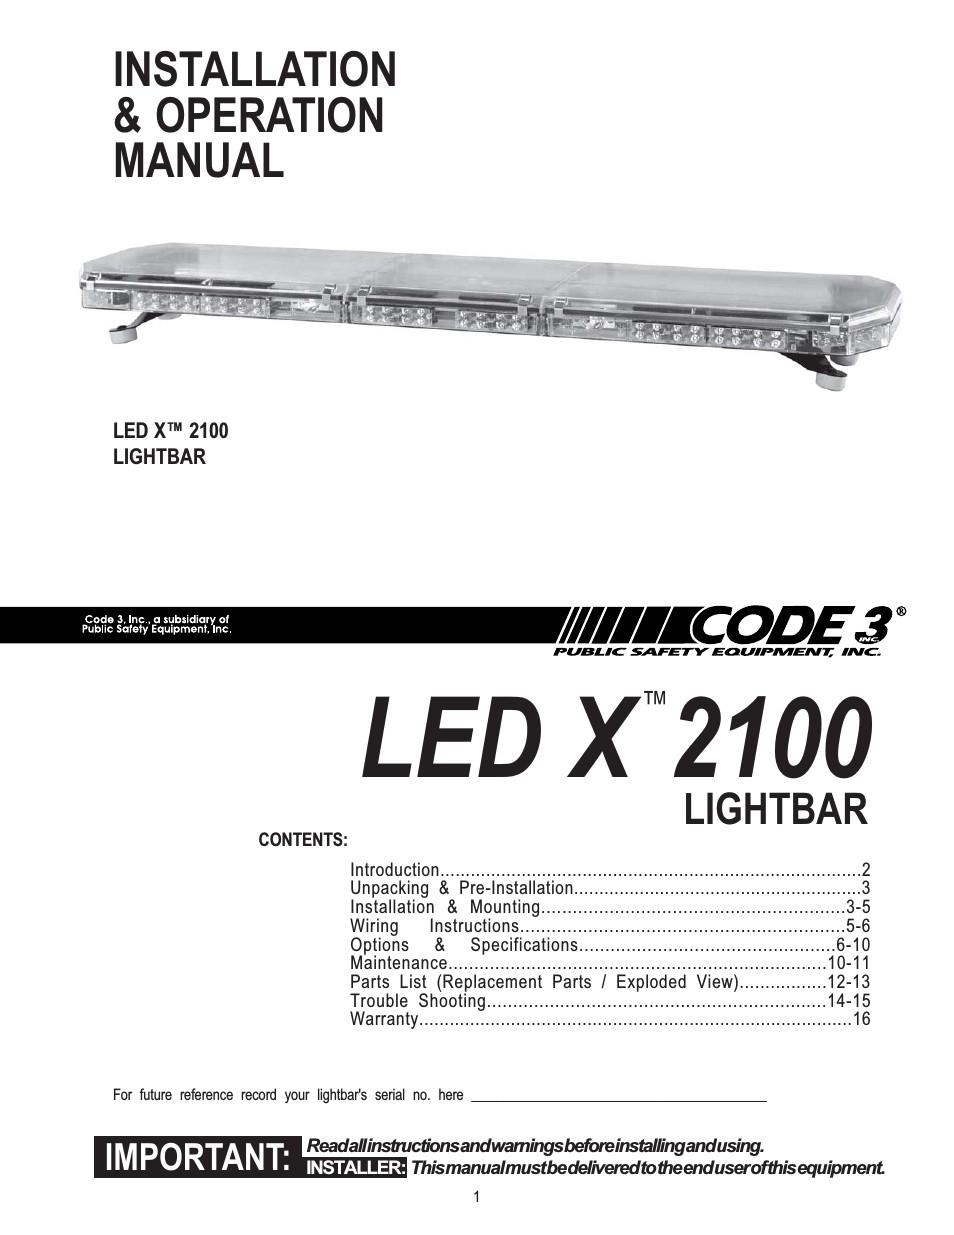 code 3 light bar wiring starting know about wiring diagram u2022 rh prezzy co code 3 mx7000 light bar wiring diagram Code 3 MX7000 Controller